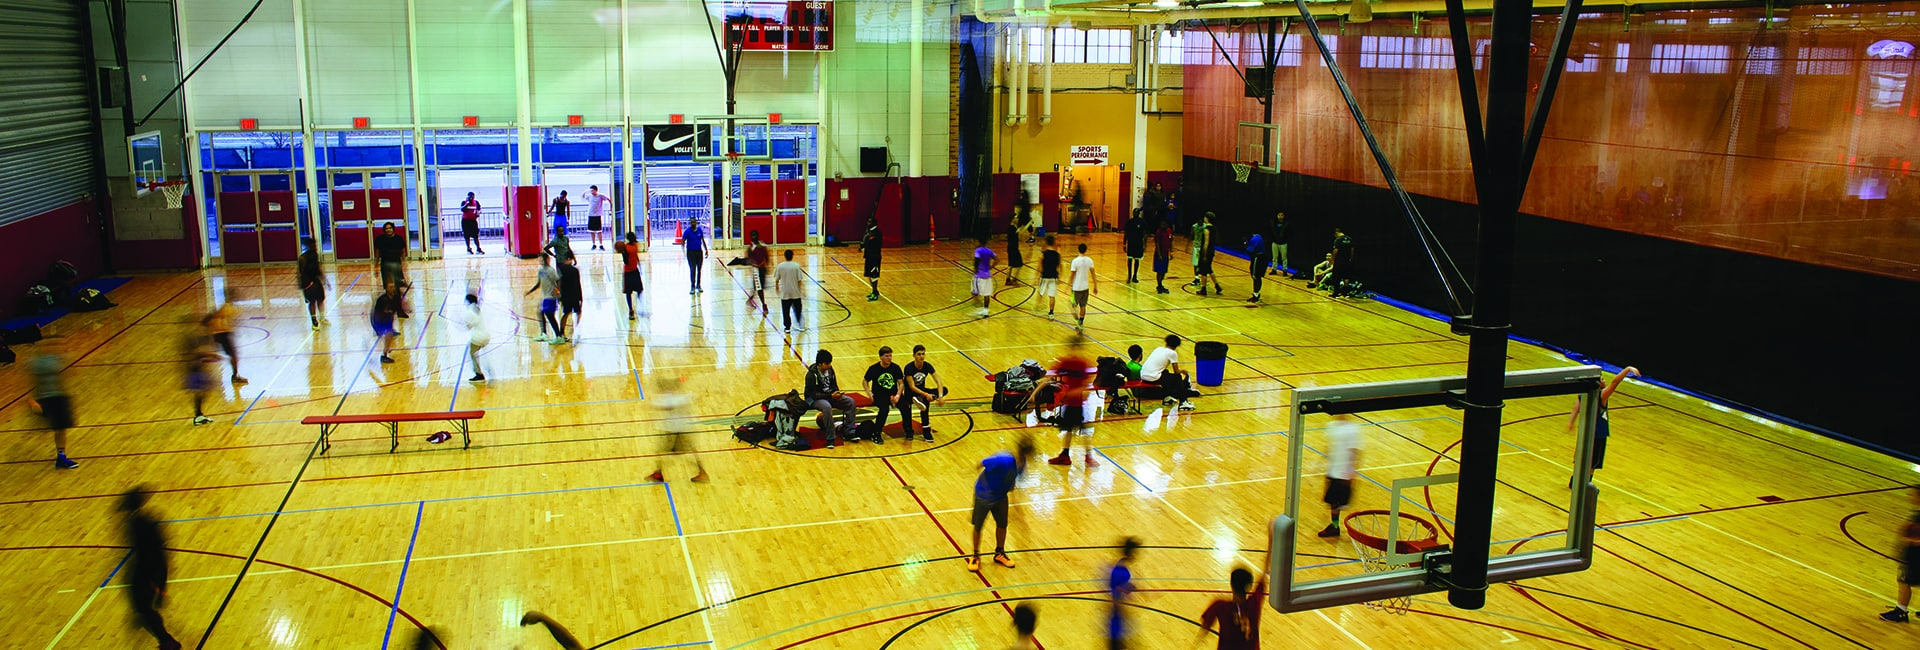 Open Basketball